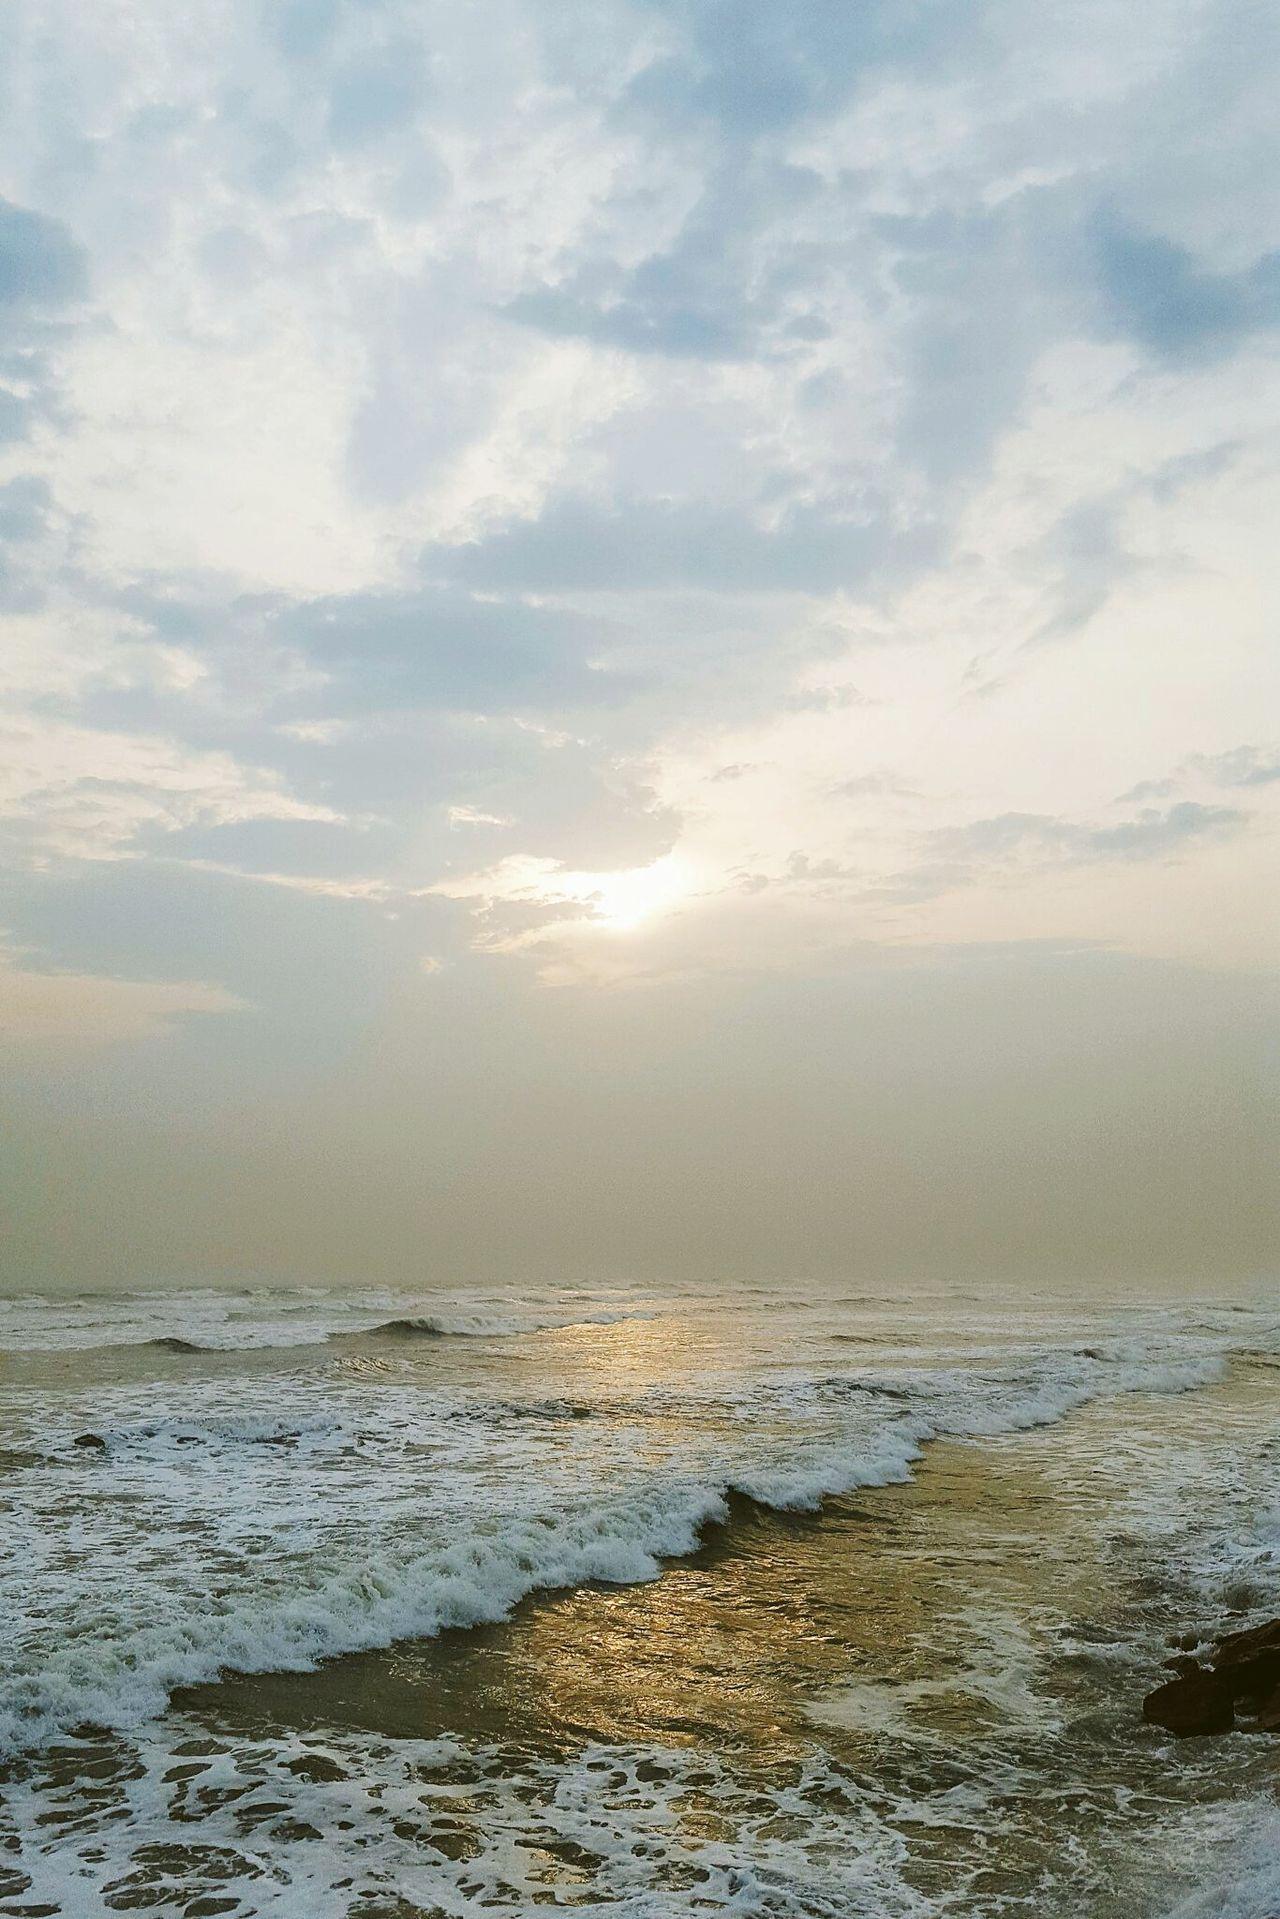 Sand Beach Nature Sea Water Outdoors No People Landscape Sky Day EyeEmNewHere Karachi